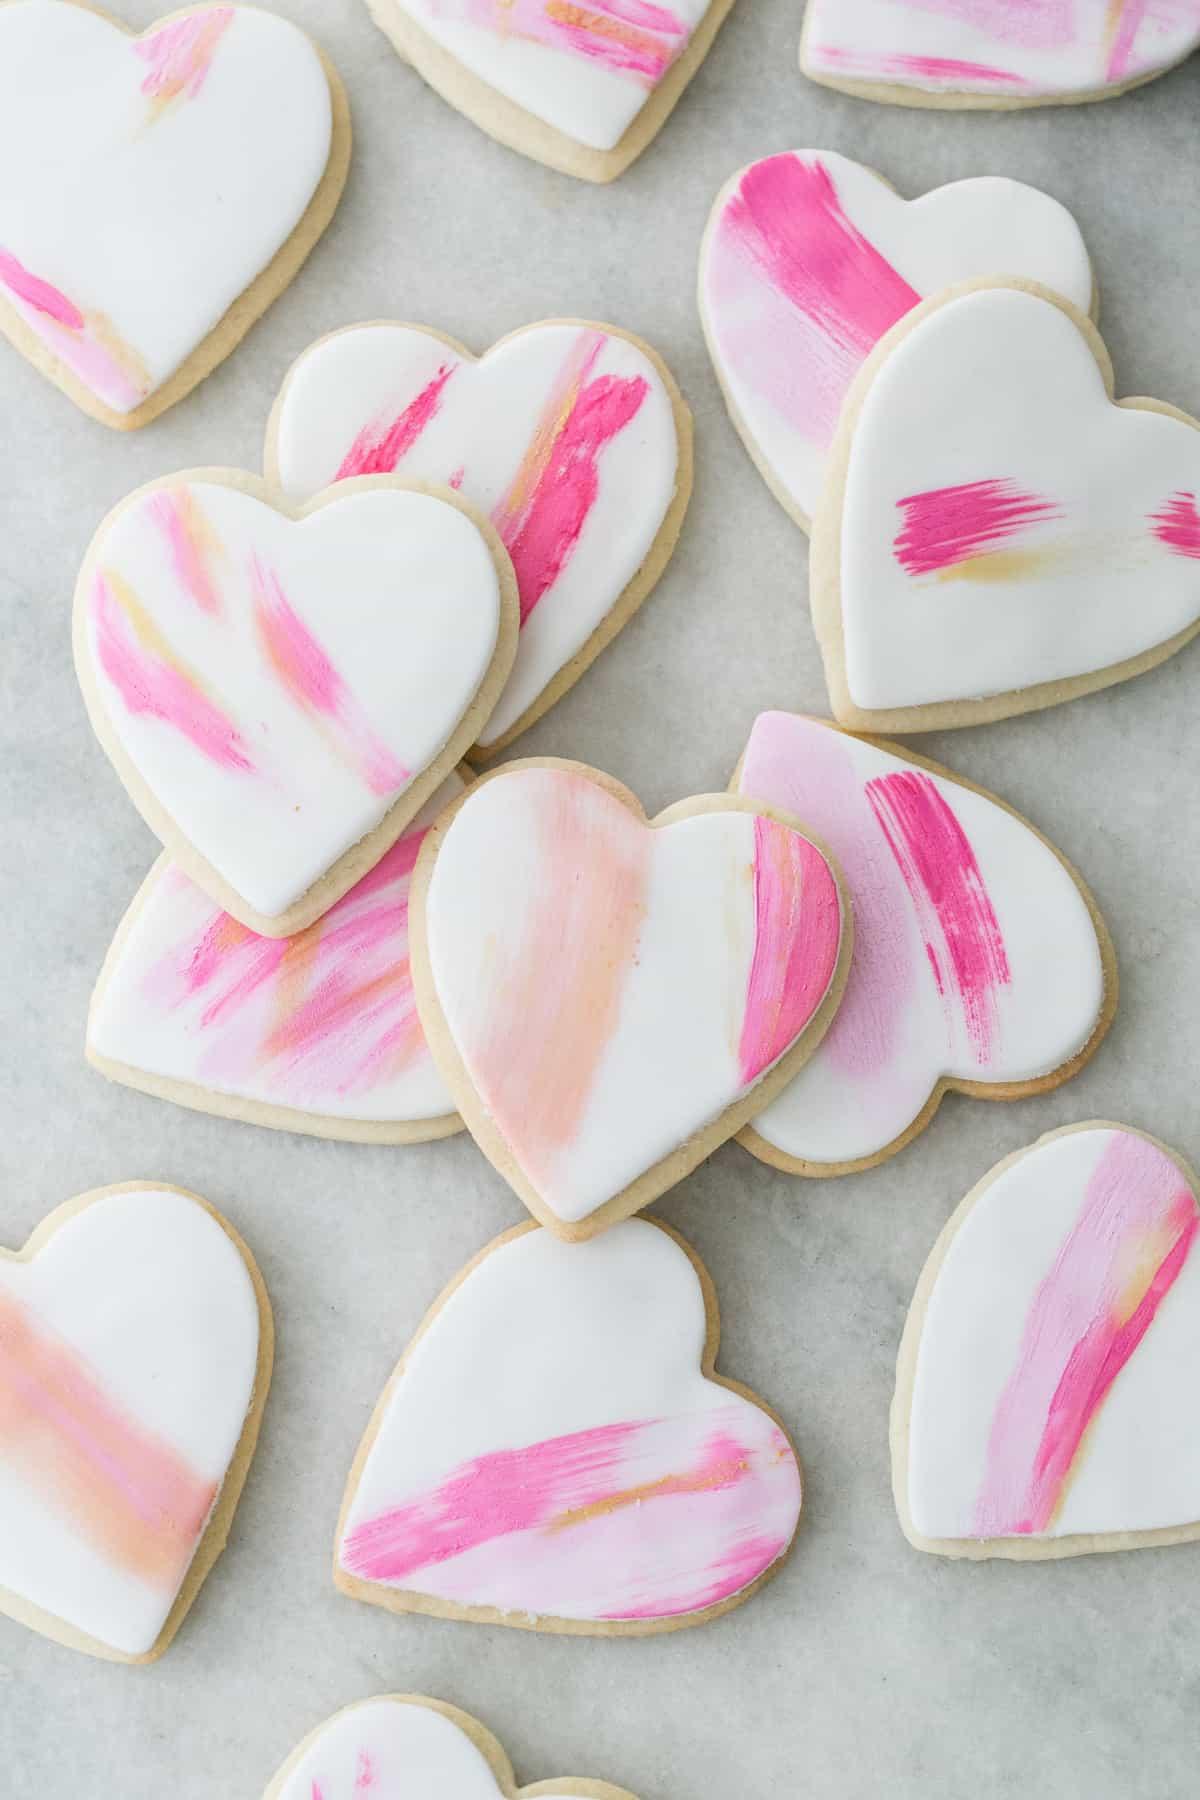 Best sugar cookie recipe for fondant